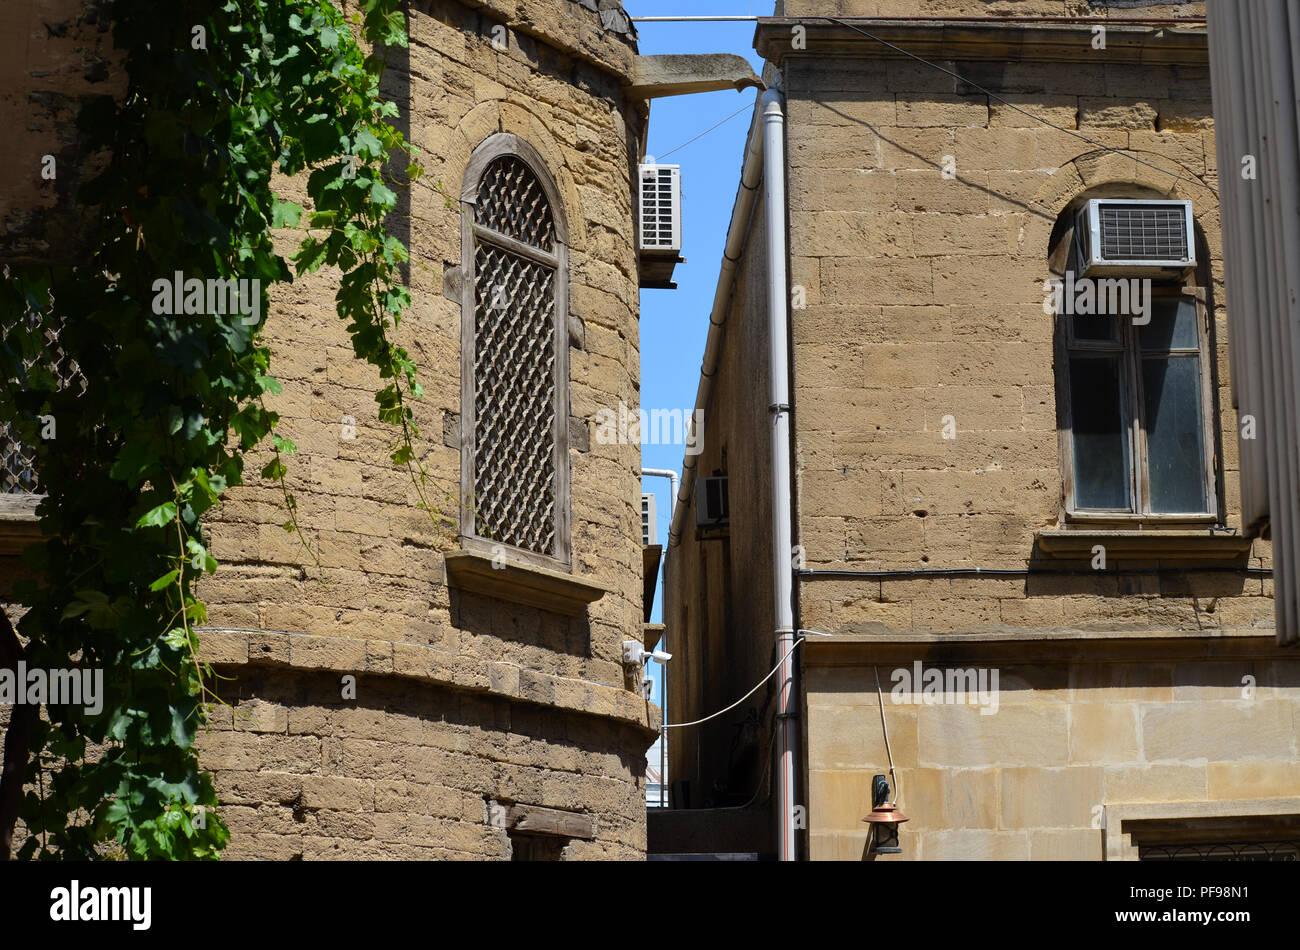 Içerisahar, the medieval Old town of Baku (Azerbaijan) - Stock Image